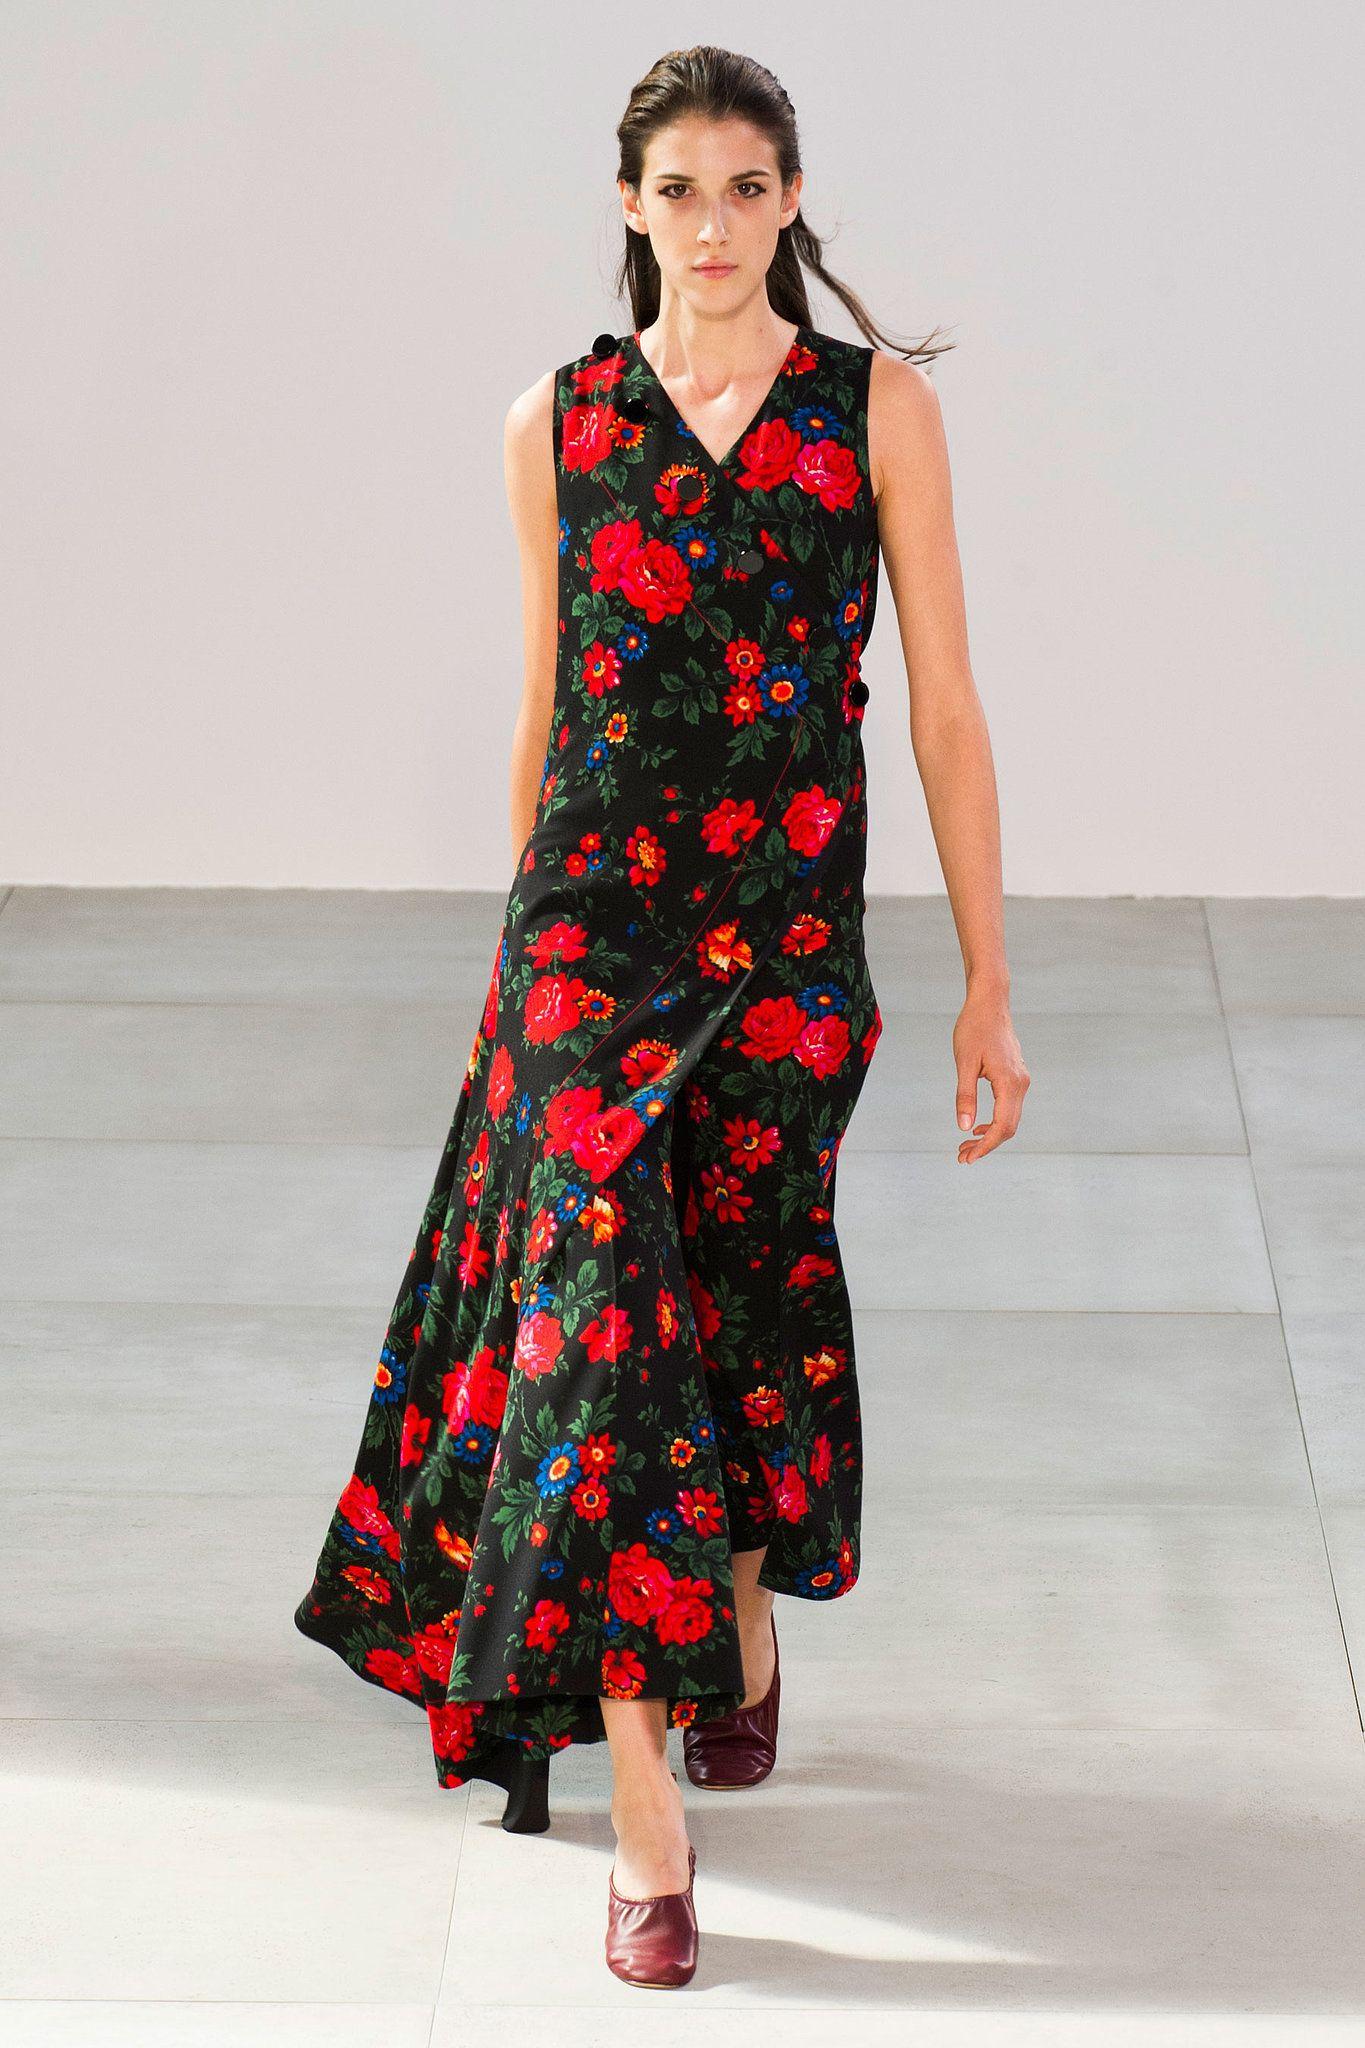 Floral Pattern Dress Spring/summer Celine xDluecetCq